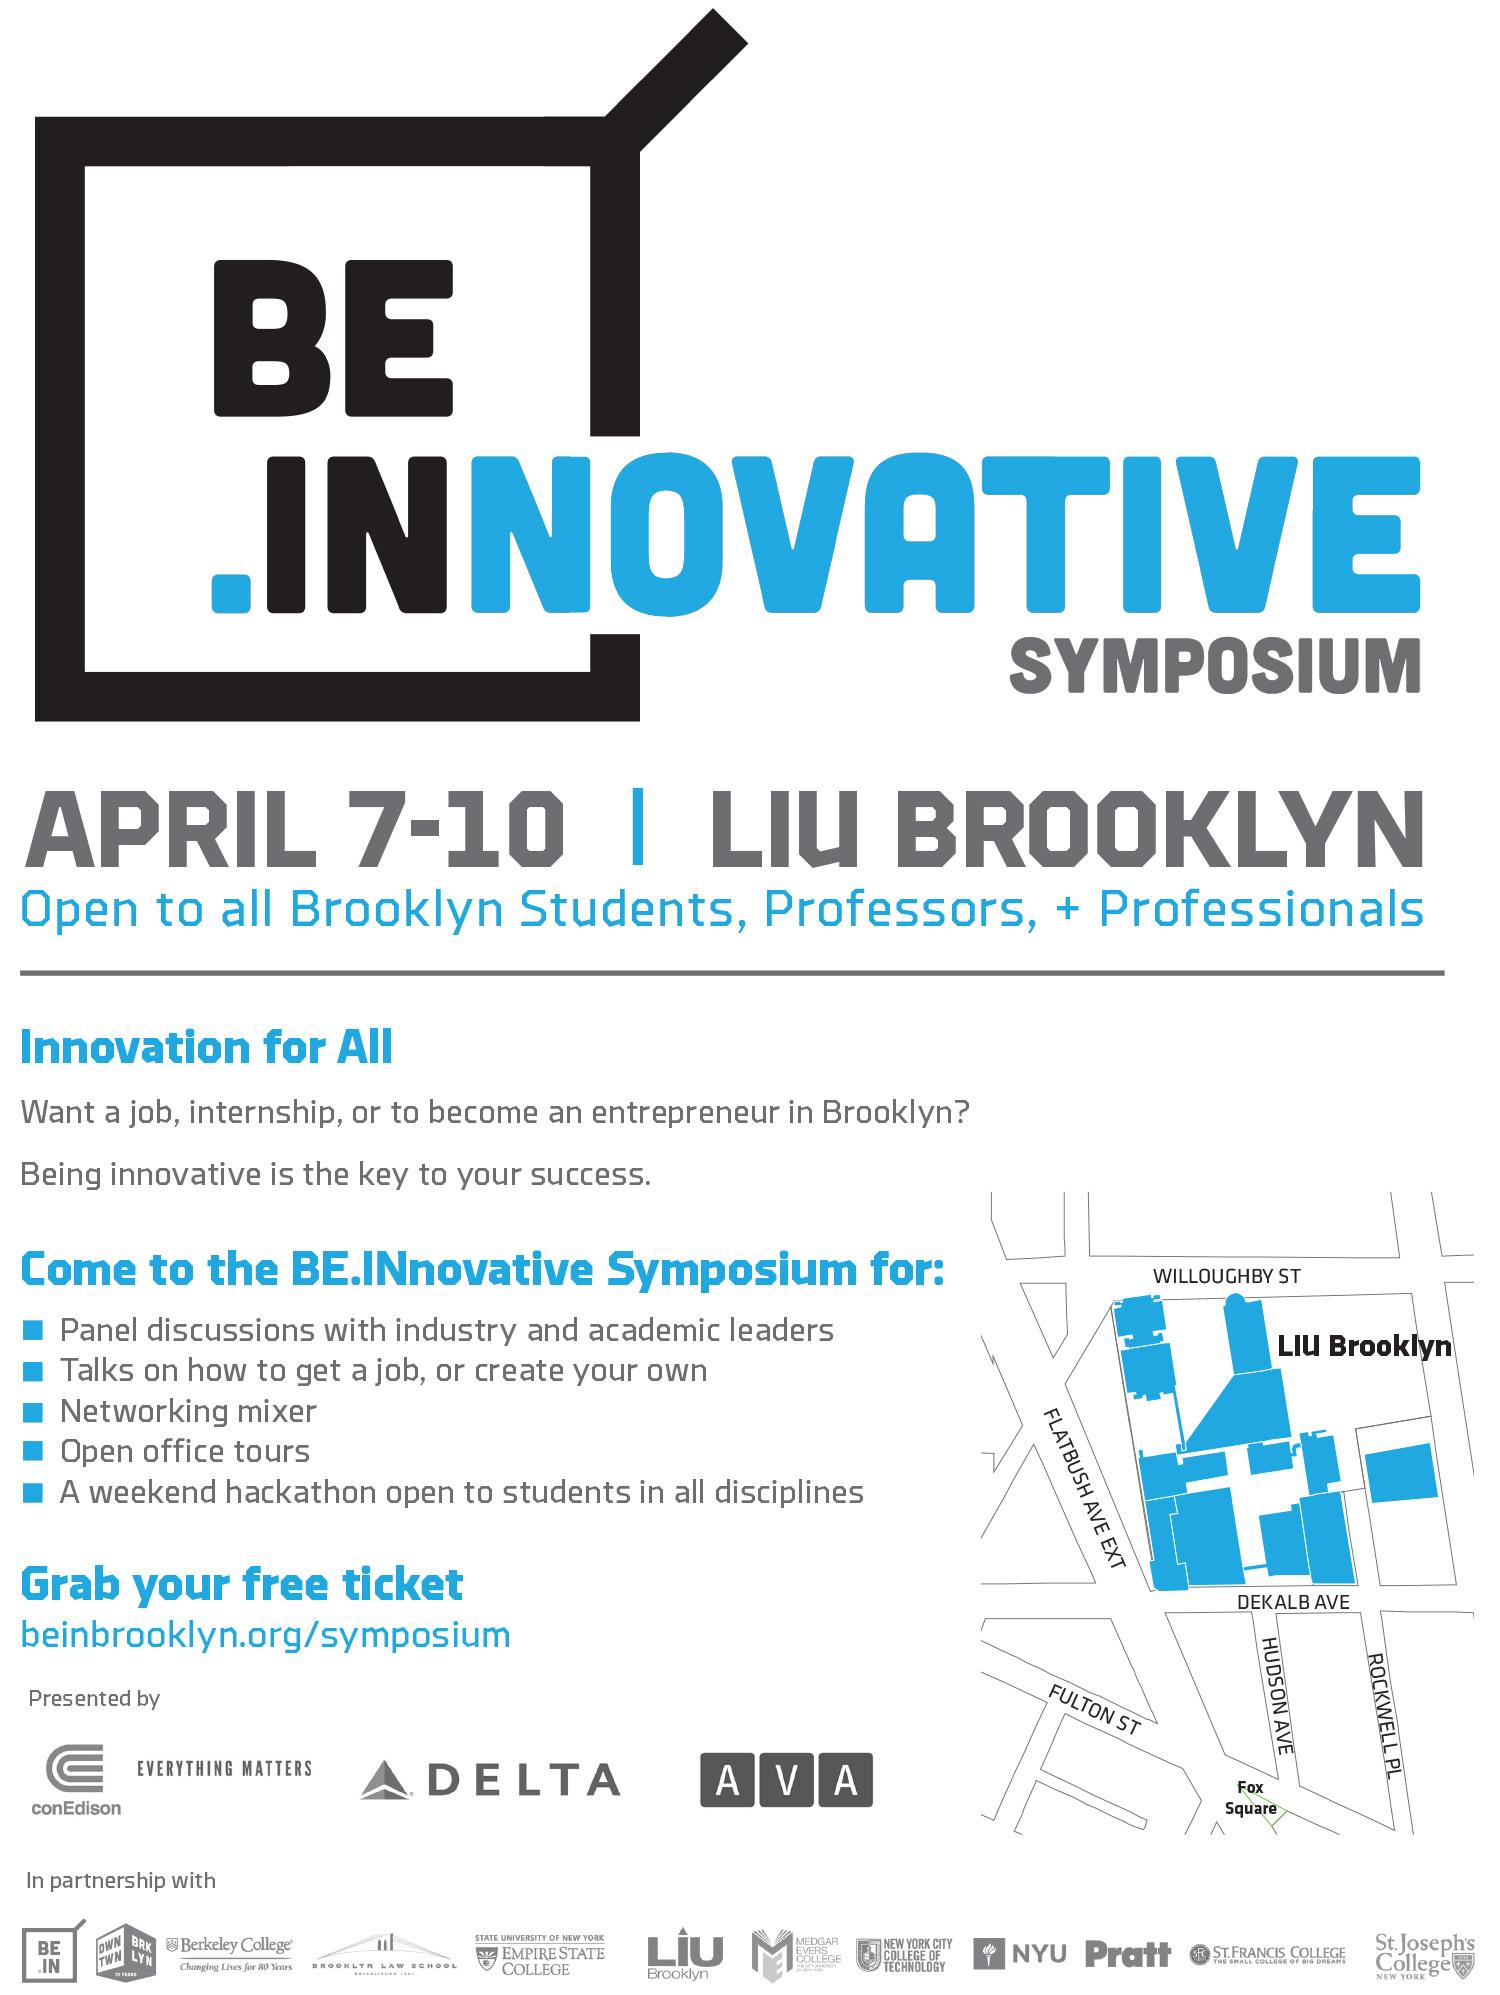 BEINNOVATIVE Symposium Flyer - with school logos